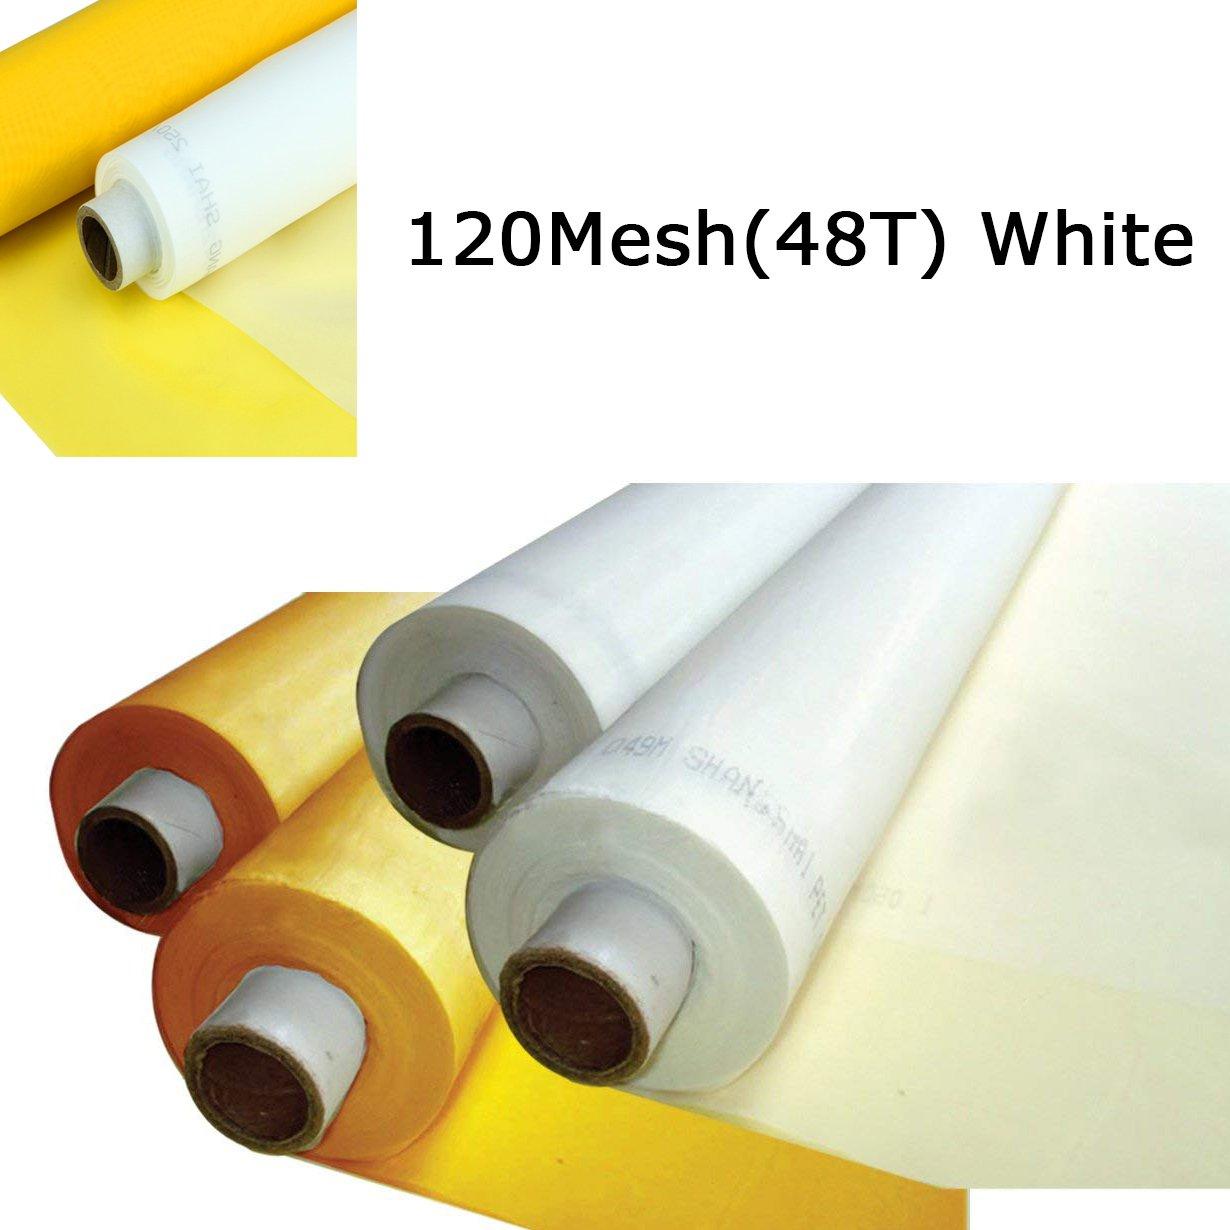 Silk Screen Printing Fabric Mesh 3 Yards 1.27 Meters Screen Printing Mesh Wide High Tension Mesh Making Ink Supplies (140 Mesh(56T)) MS WGO 3Yards Silk Screen